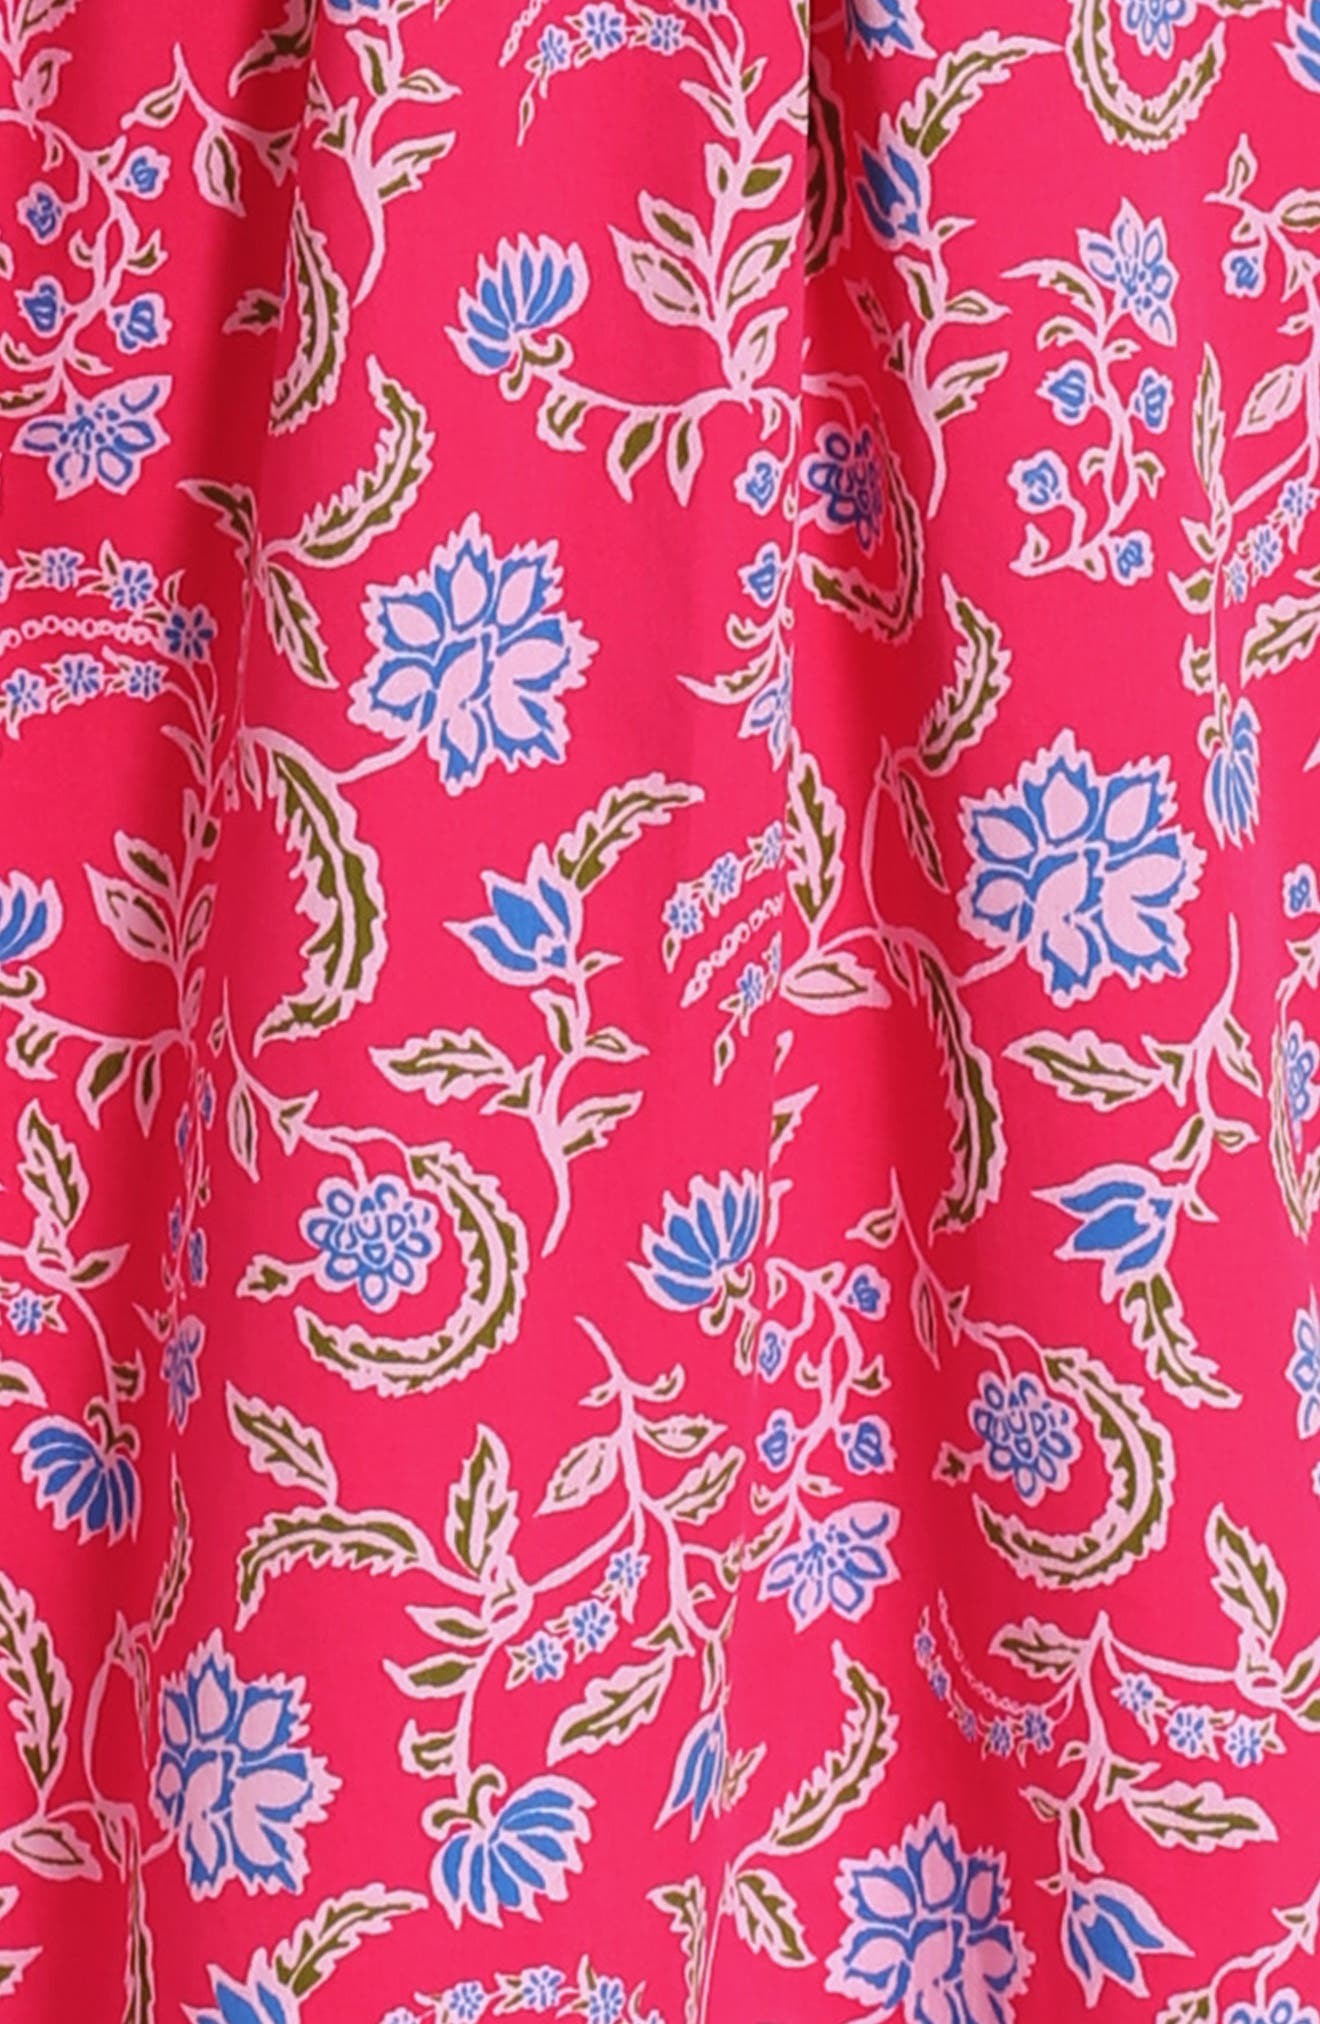 Lotus Flower Dress,                             Alternate thumbnail 3, color,                             696